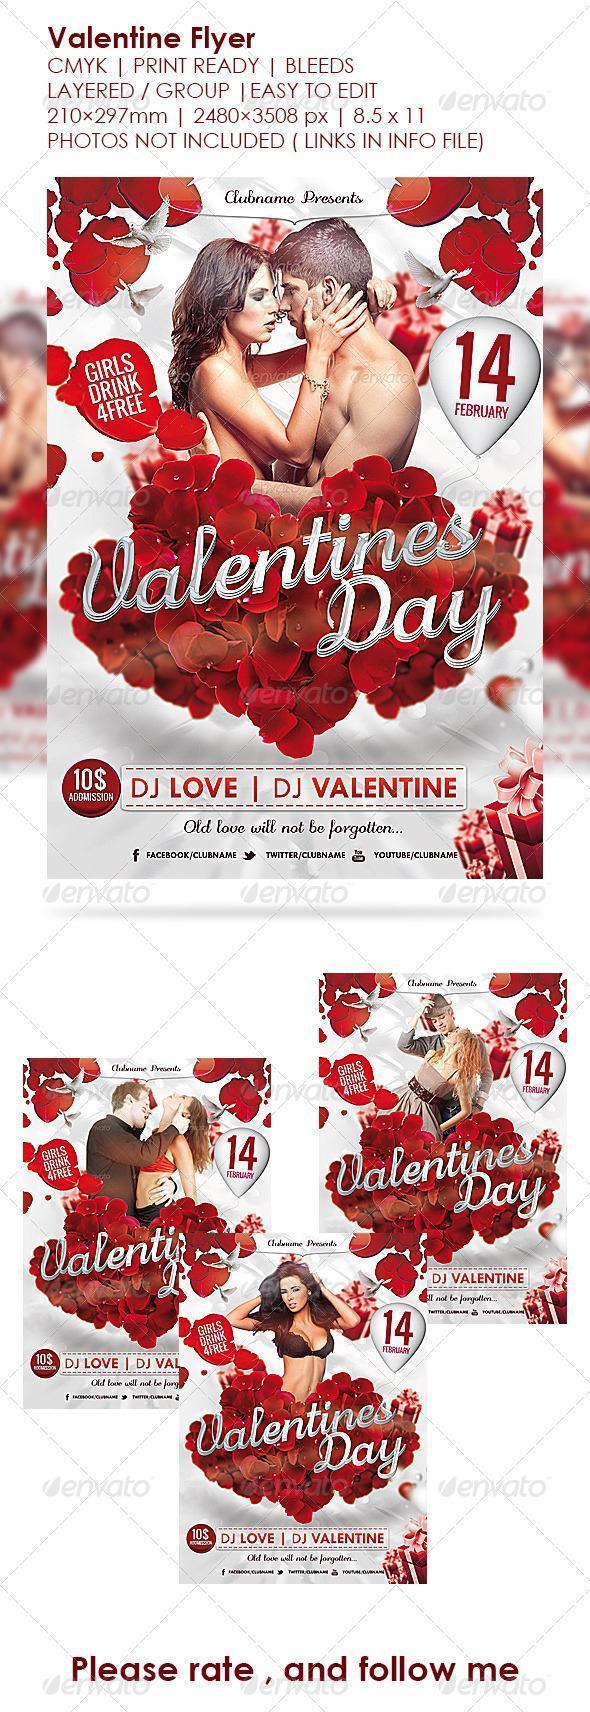 Free Printable Valentine Day Flyer